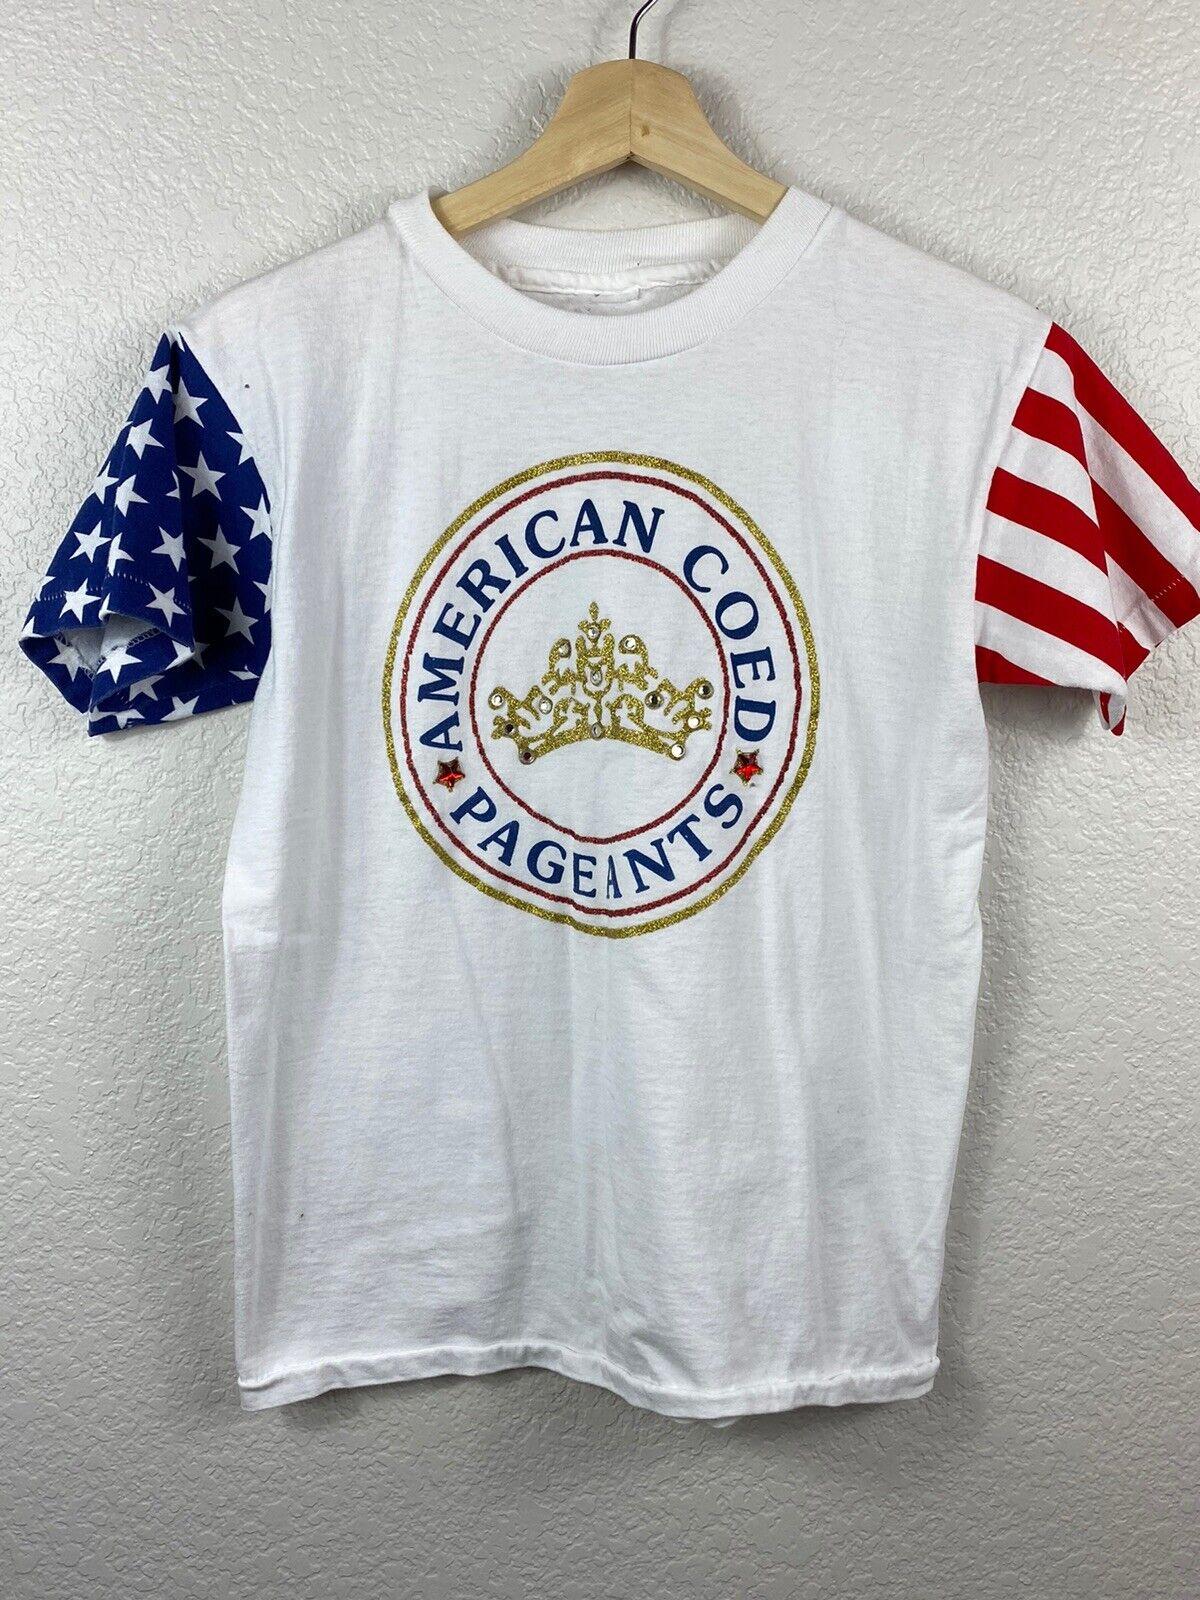 American Coed Pageants T-Shirt Vintage Single Stitch Stars Stripes Patriotic S